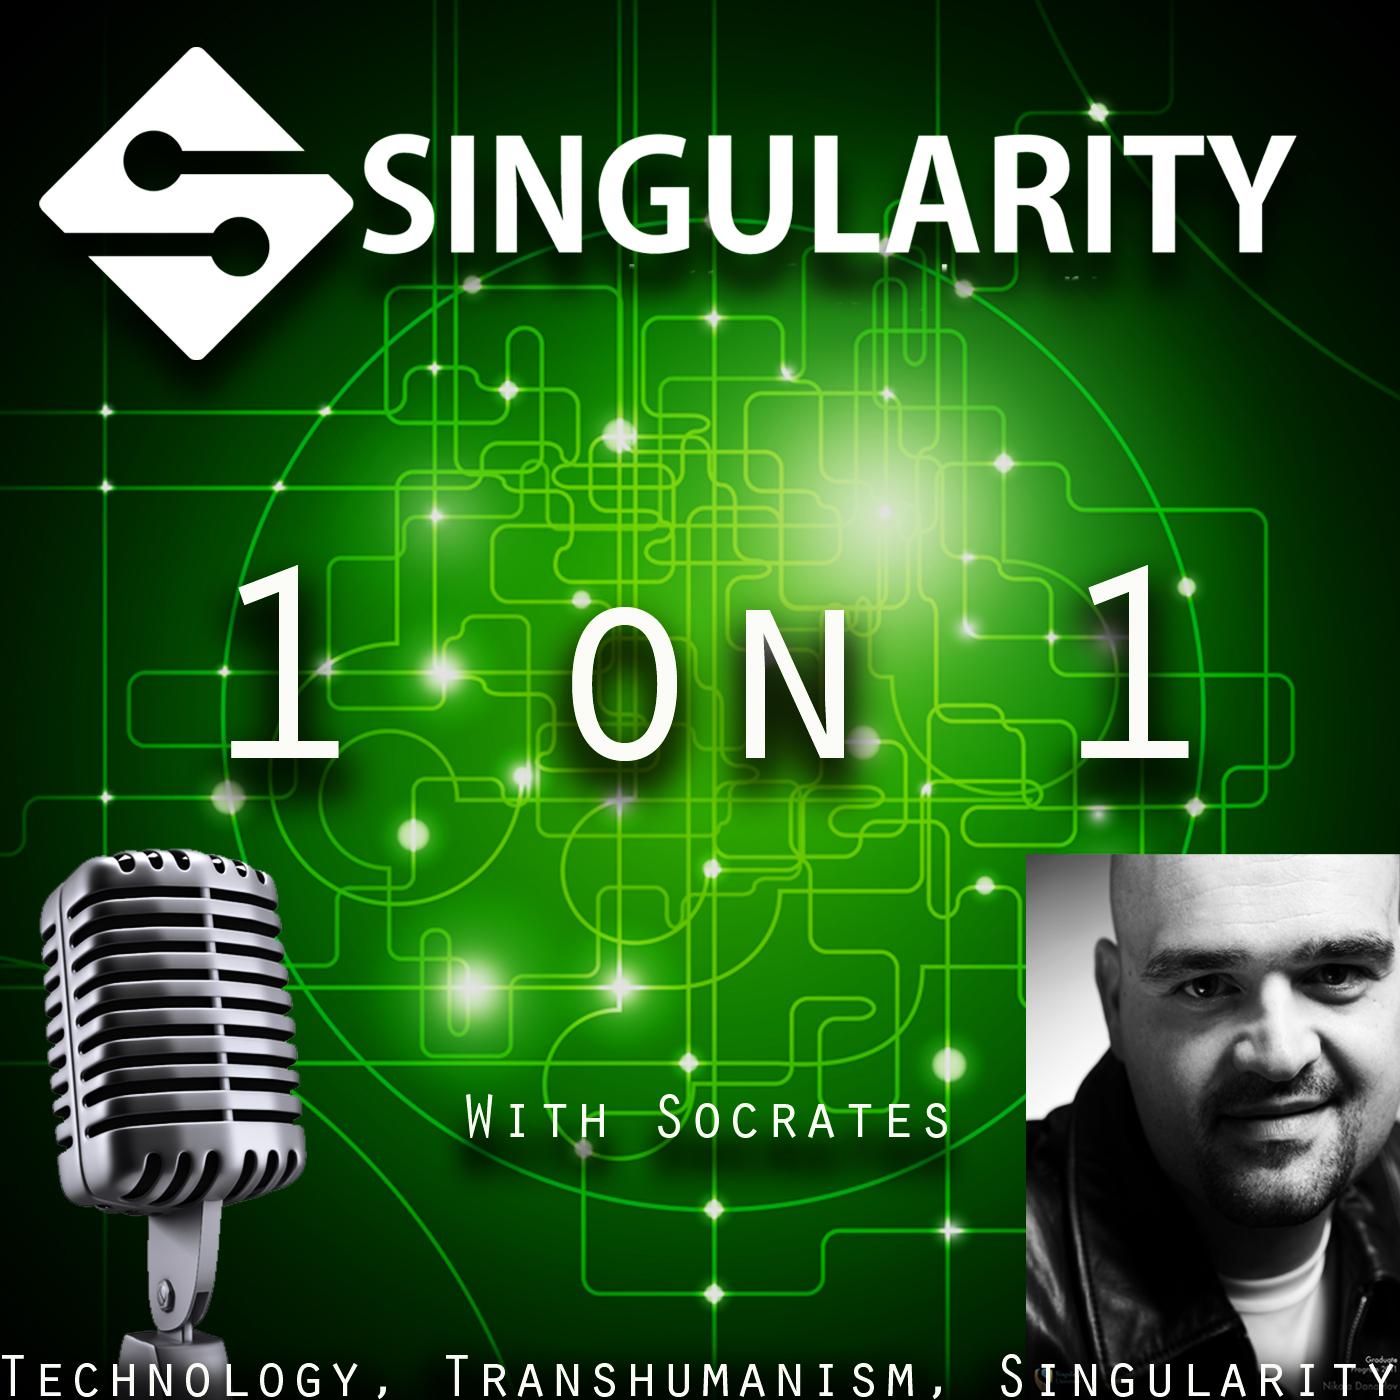 Singularity 1 on 1